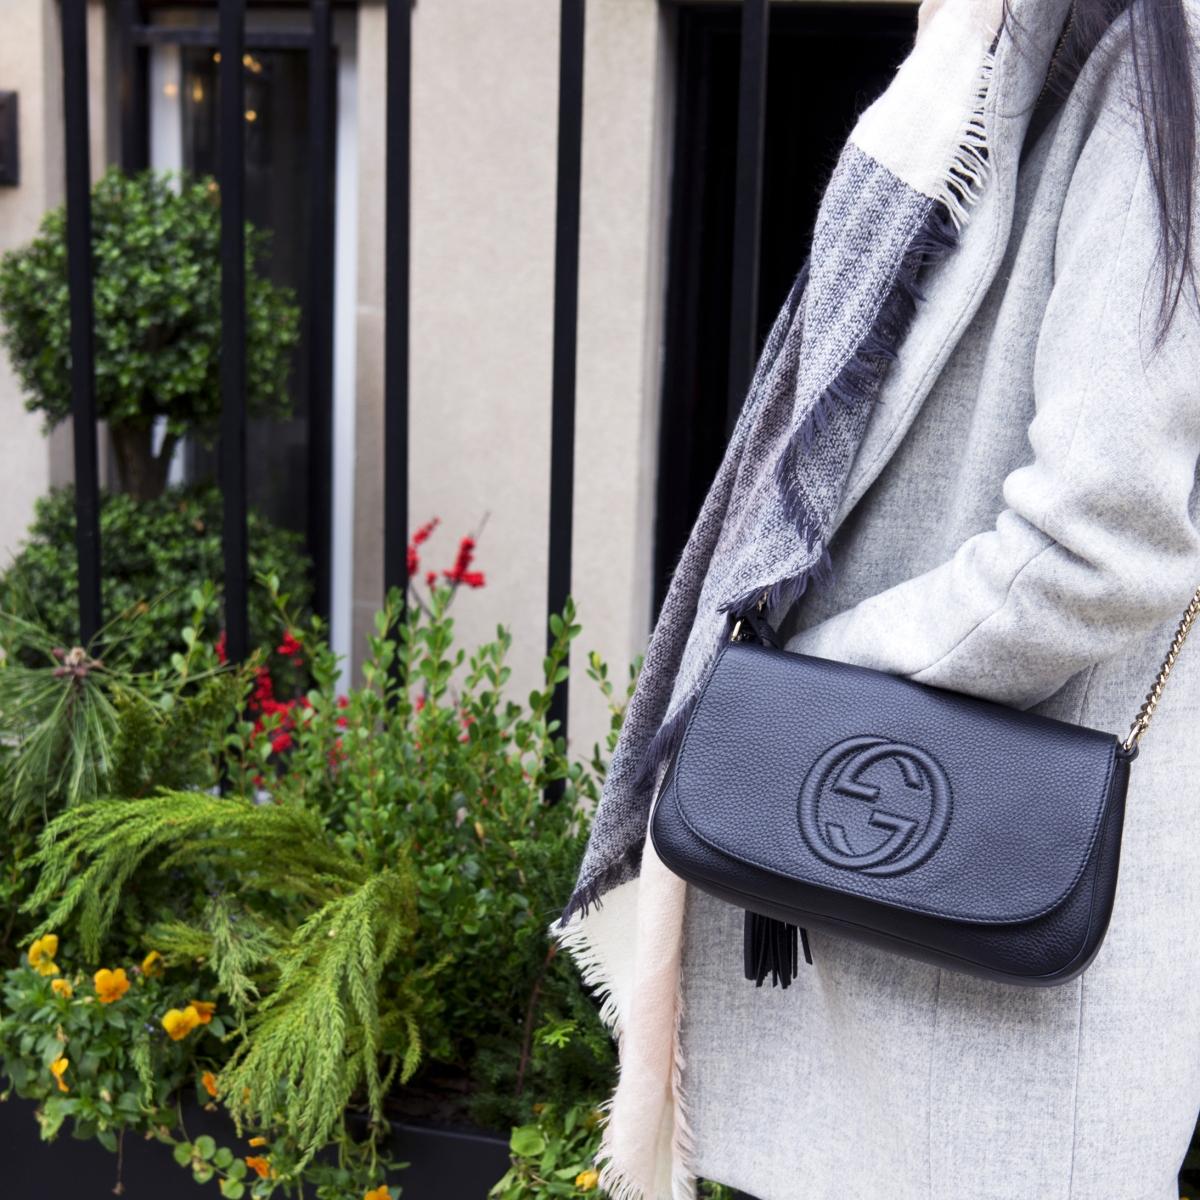 a2c30addd49 Review  Gucci Soho Chain Shoulder Bag – BAG WATCH